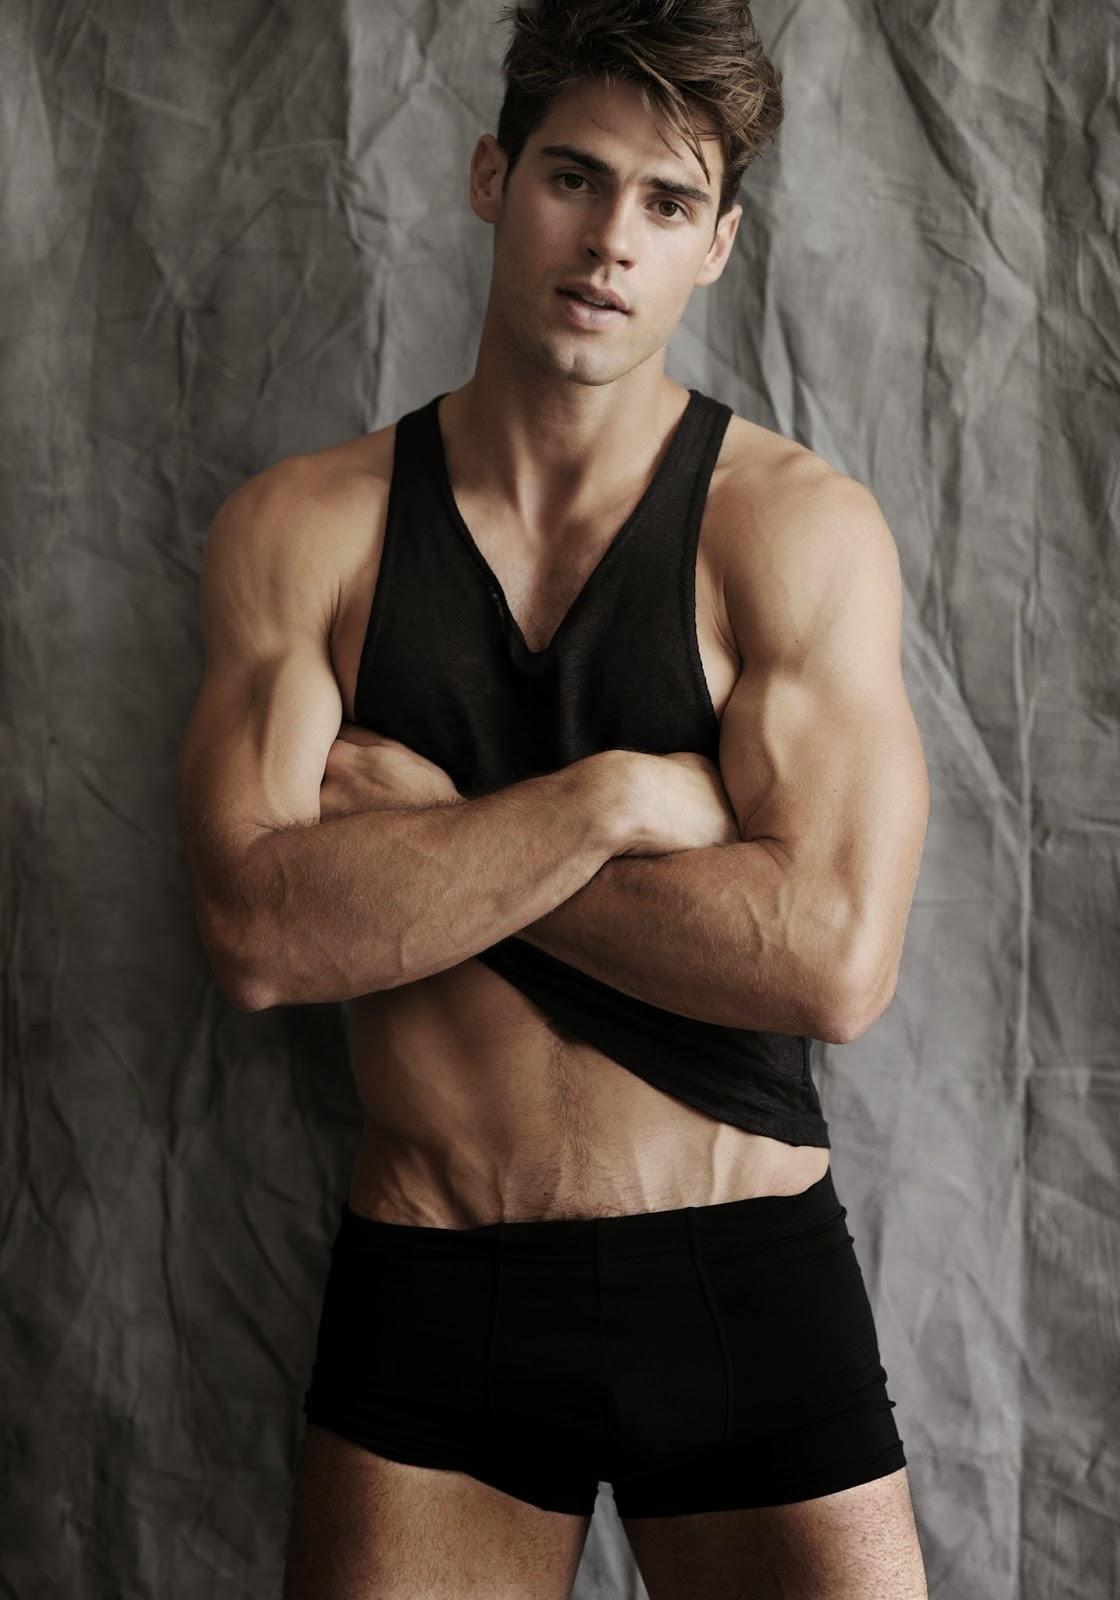 Chad White by Photographer Fabian Morassut – Fashionably Male